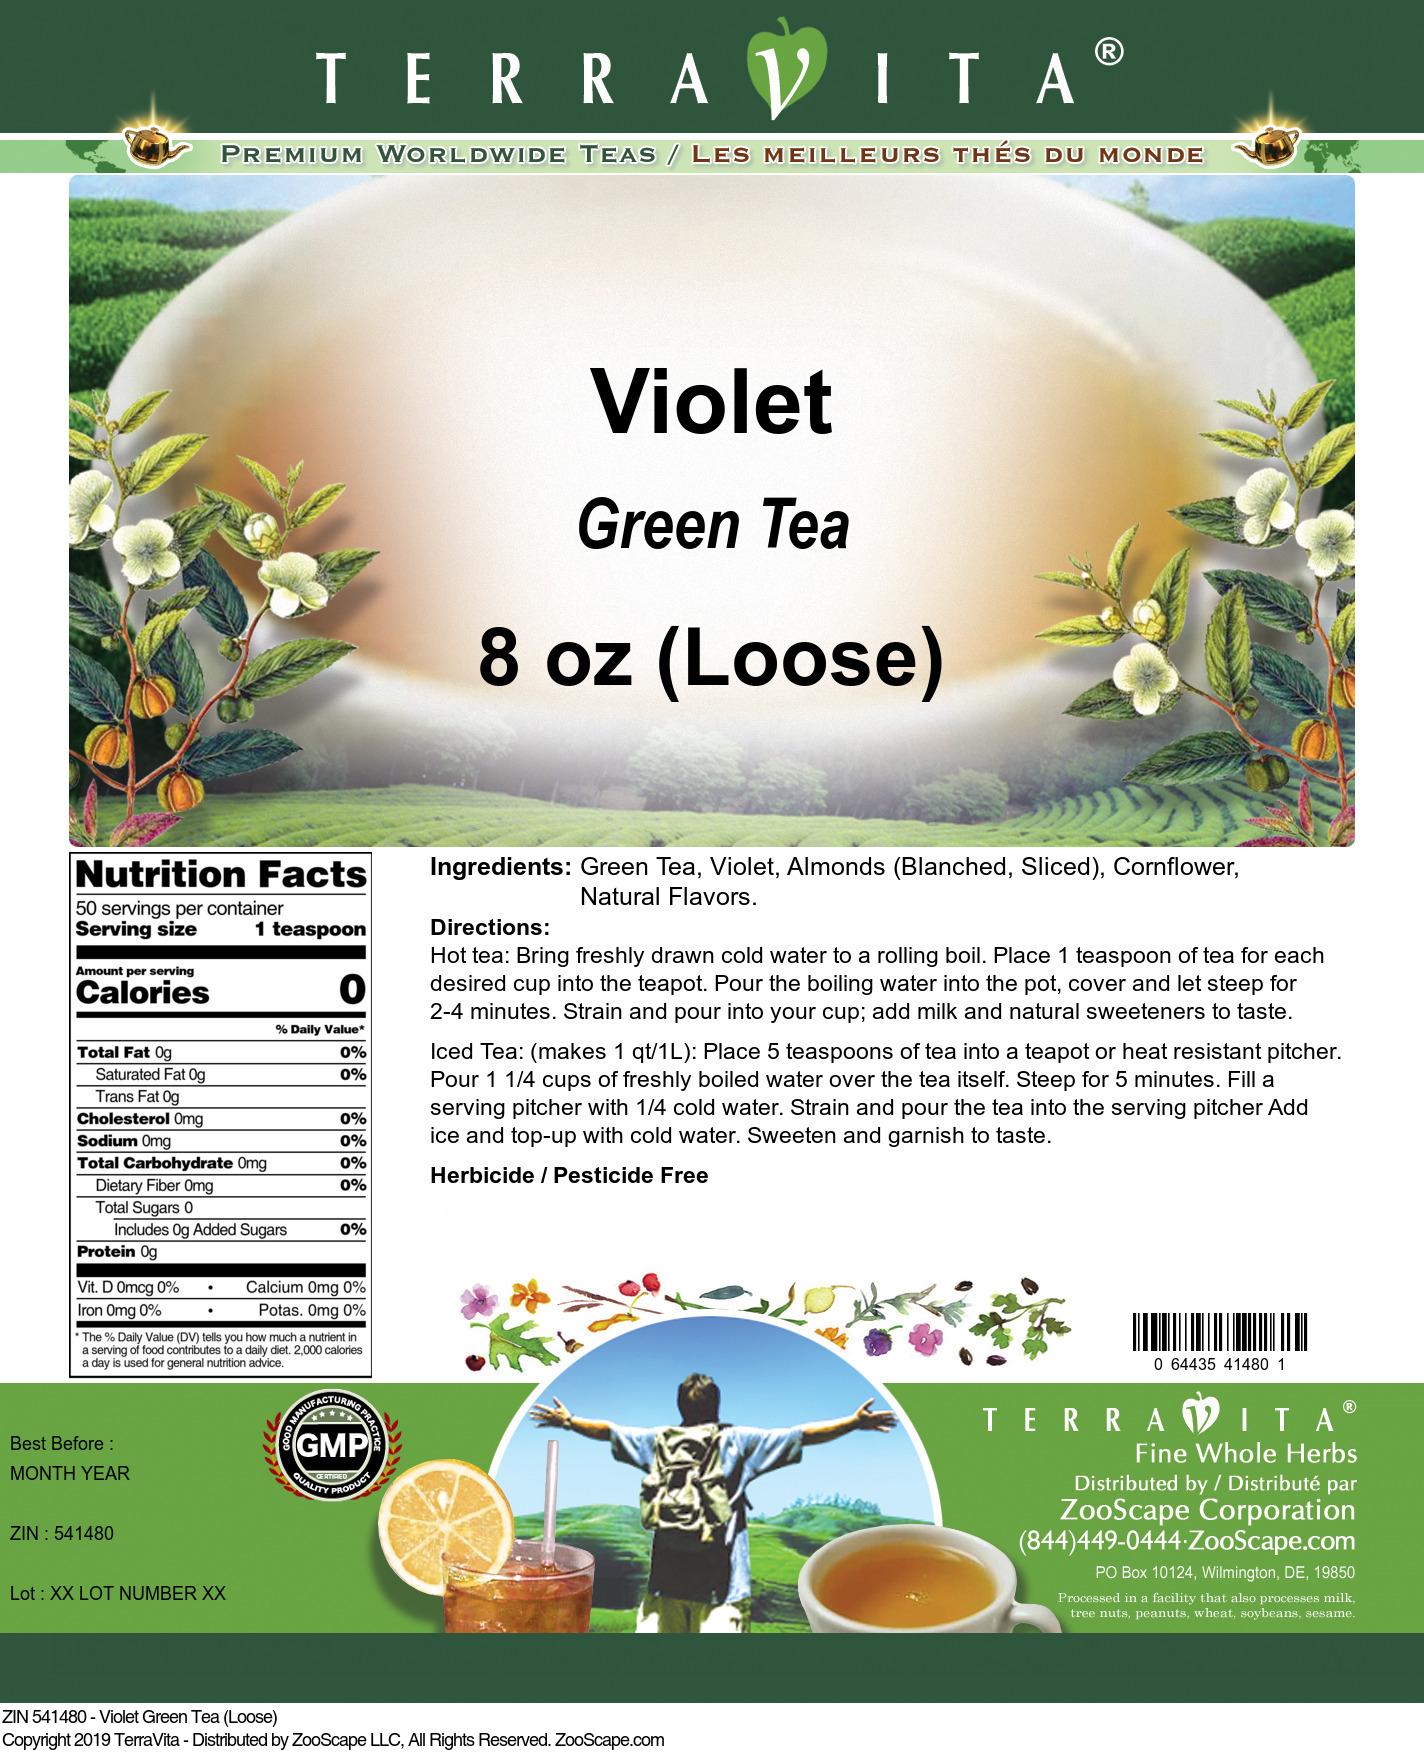 Violet Green Tea (Loose)